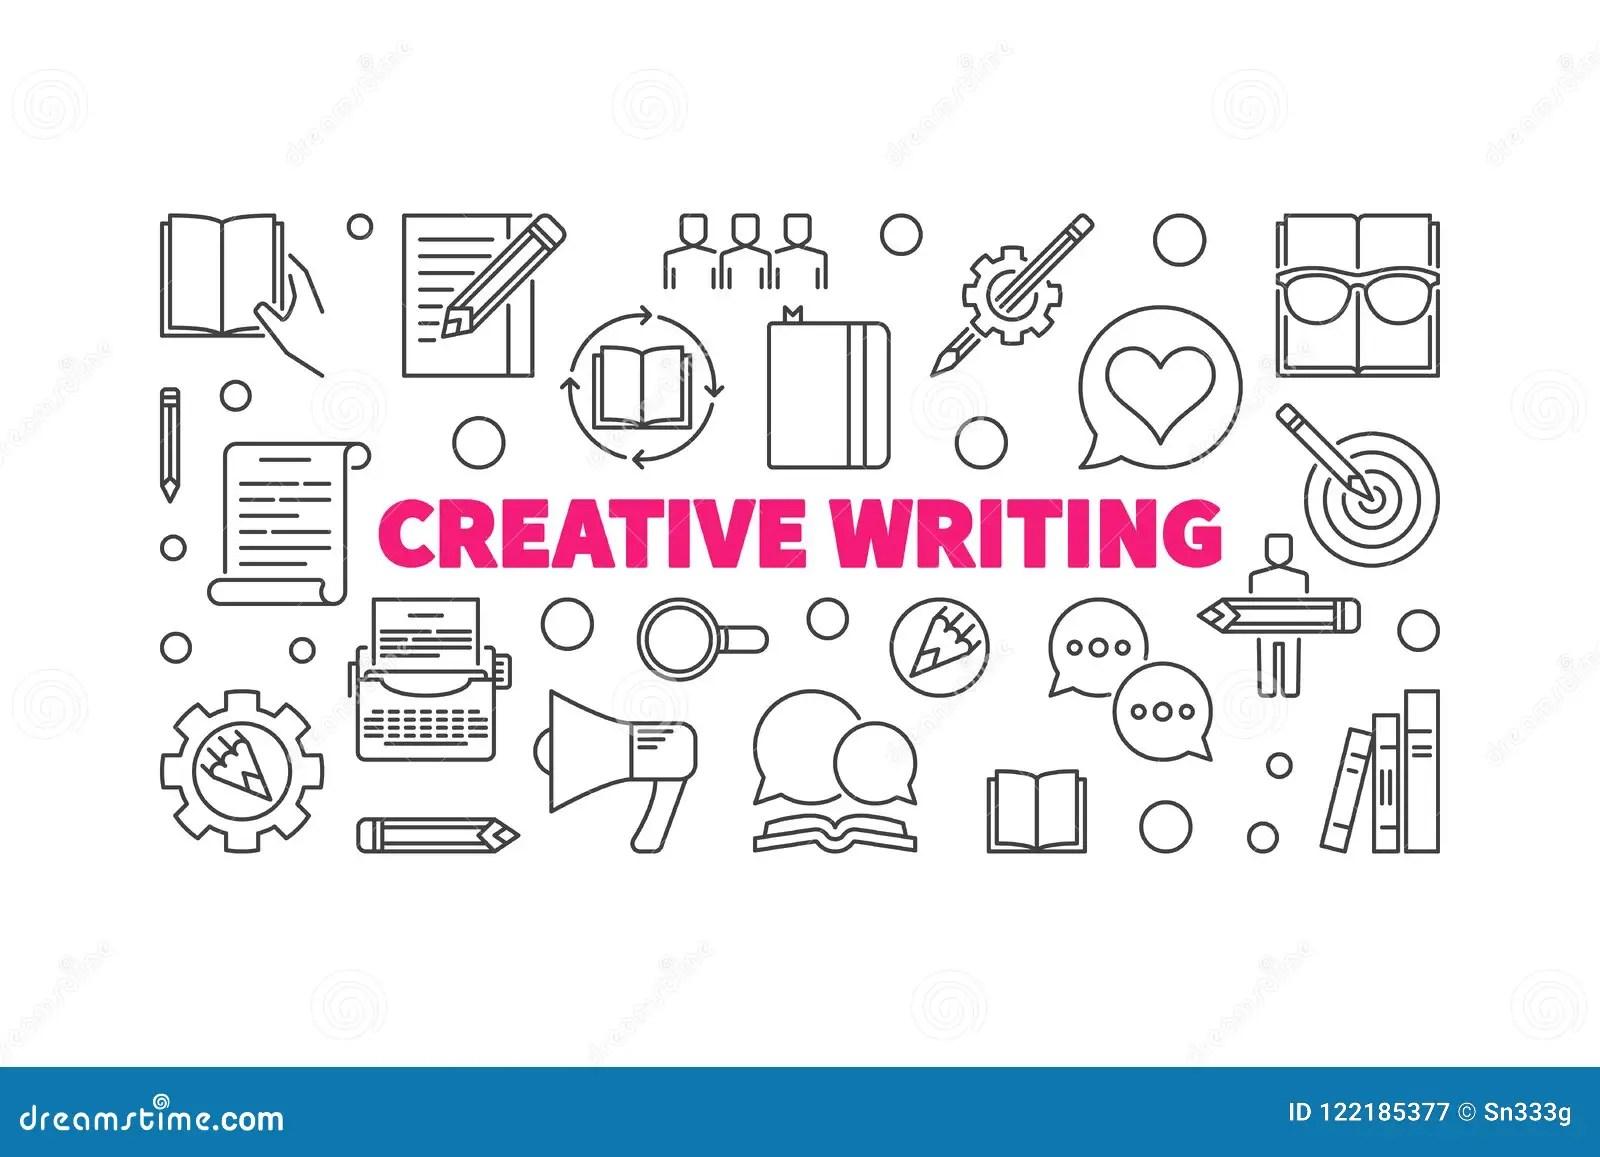 Creative Writing Vector Horizontal Linear Illustration